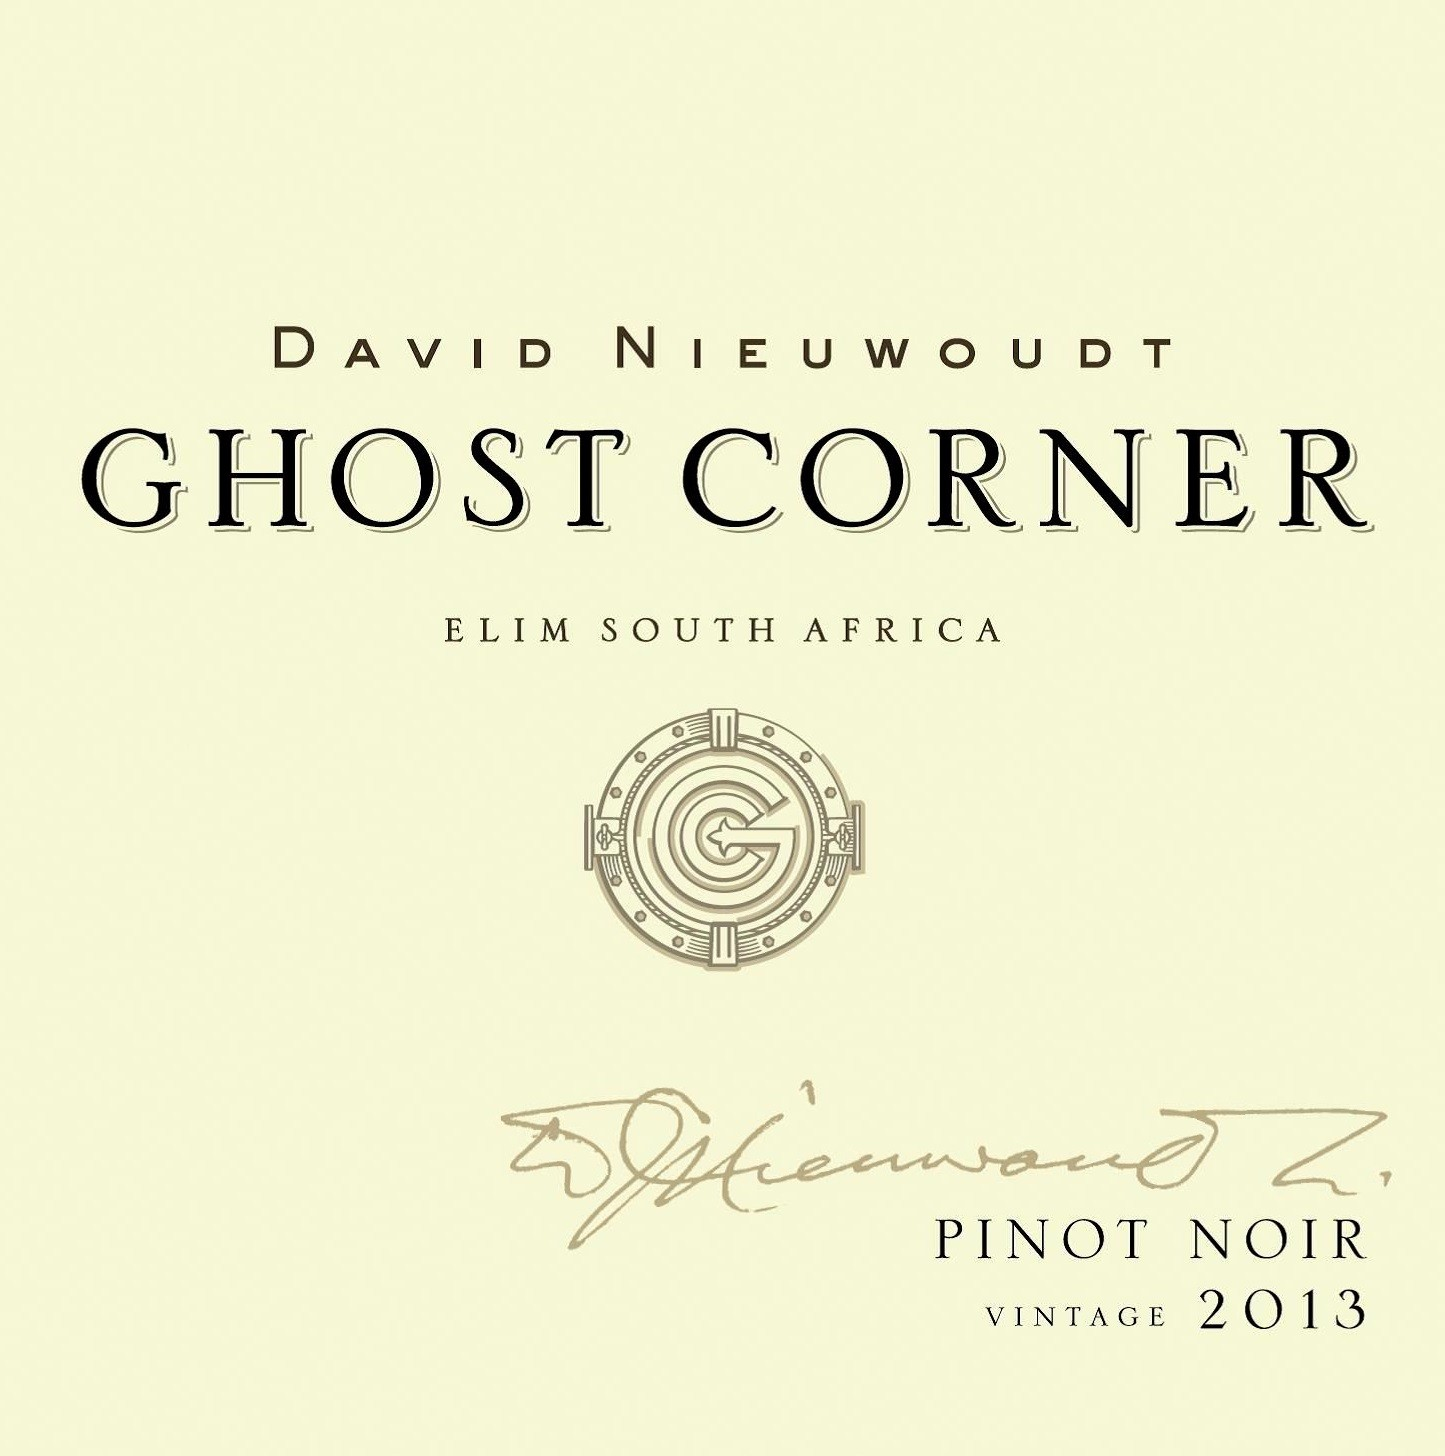 David Nieuwoudt Ghost Corner Sauvignon Blanc 2015 (Cederberg Private Cellar)